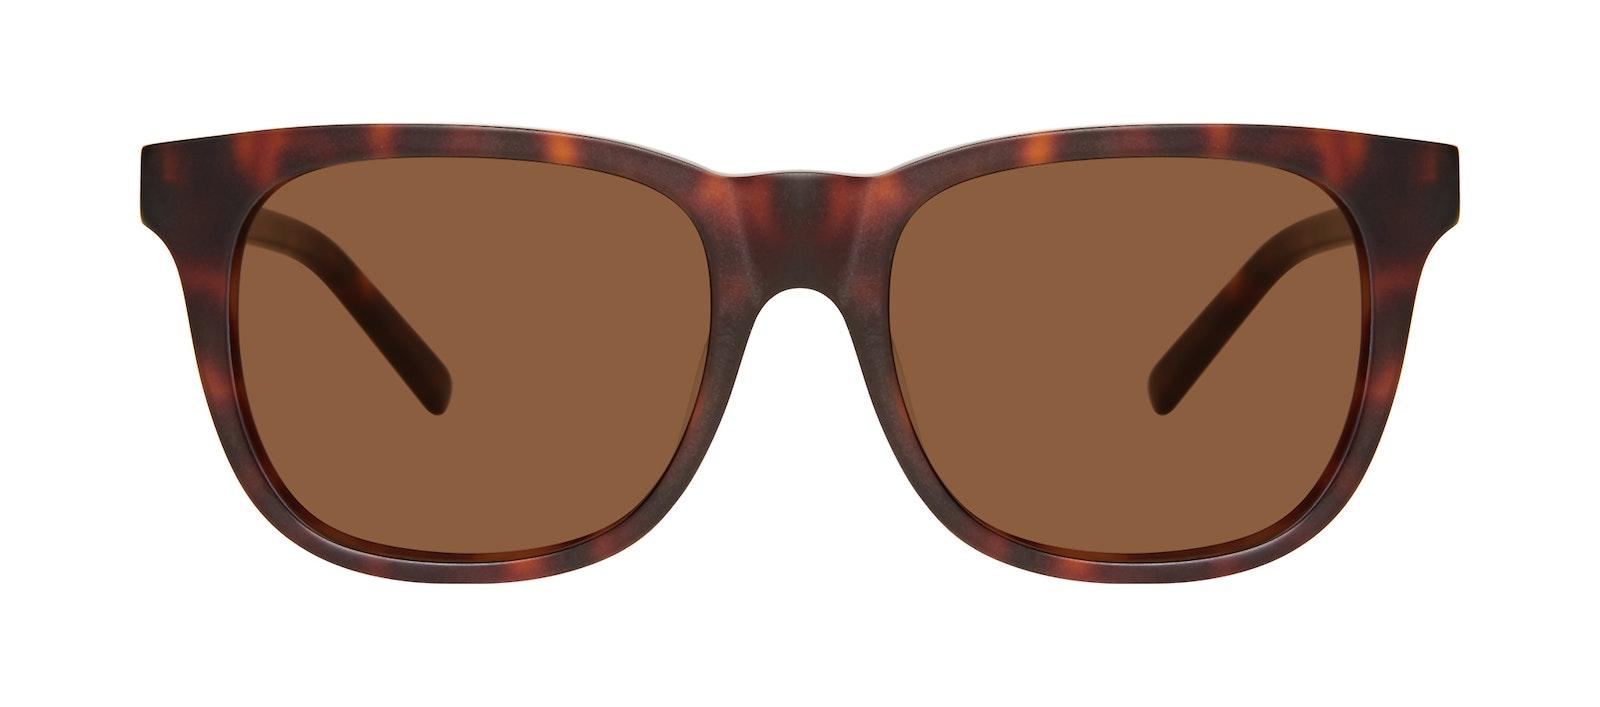 Affordable Fashion Glasses Square Sunglasses Men Solo L Matte Tortoise Front